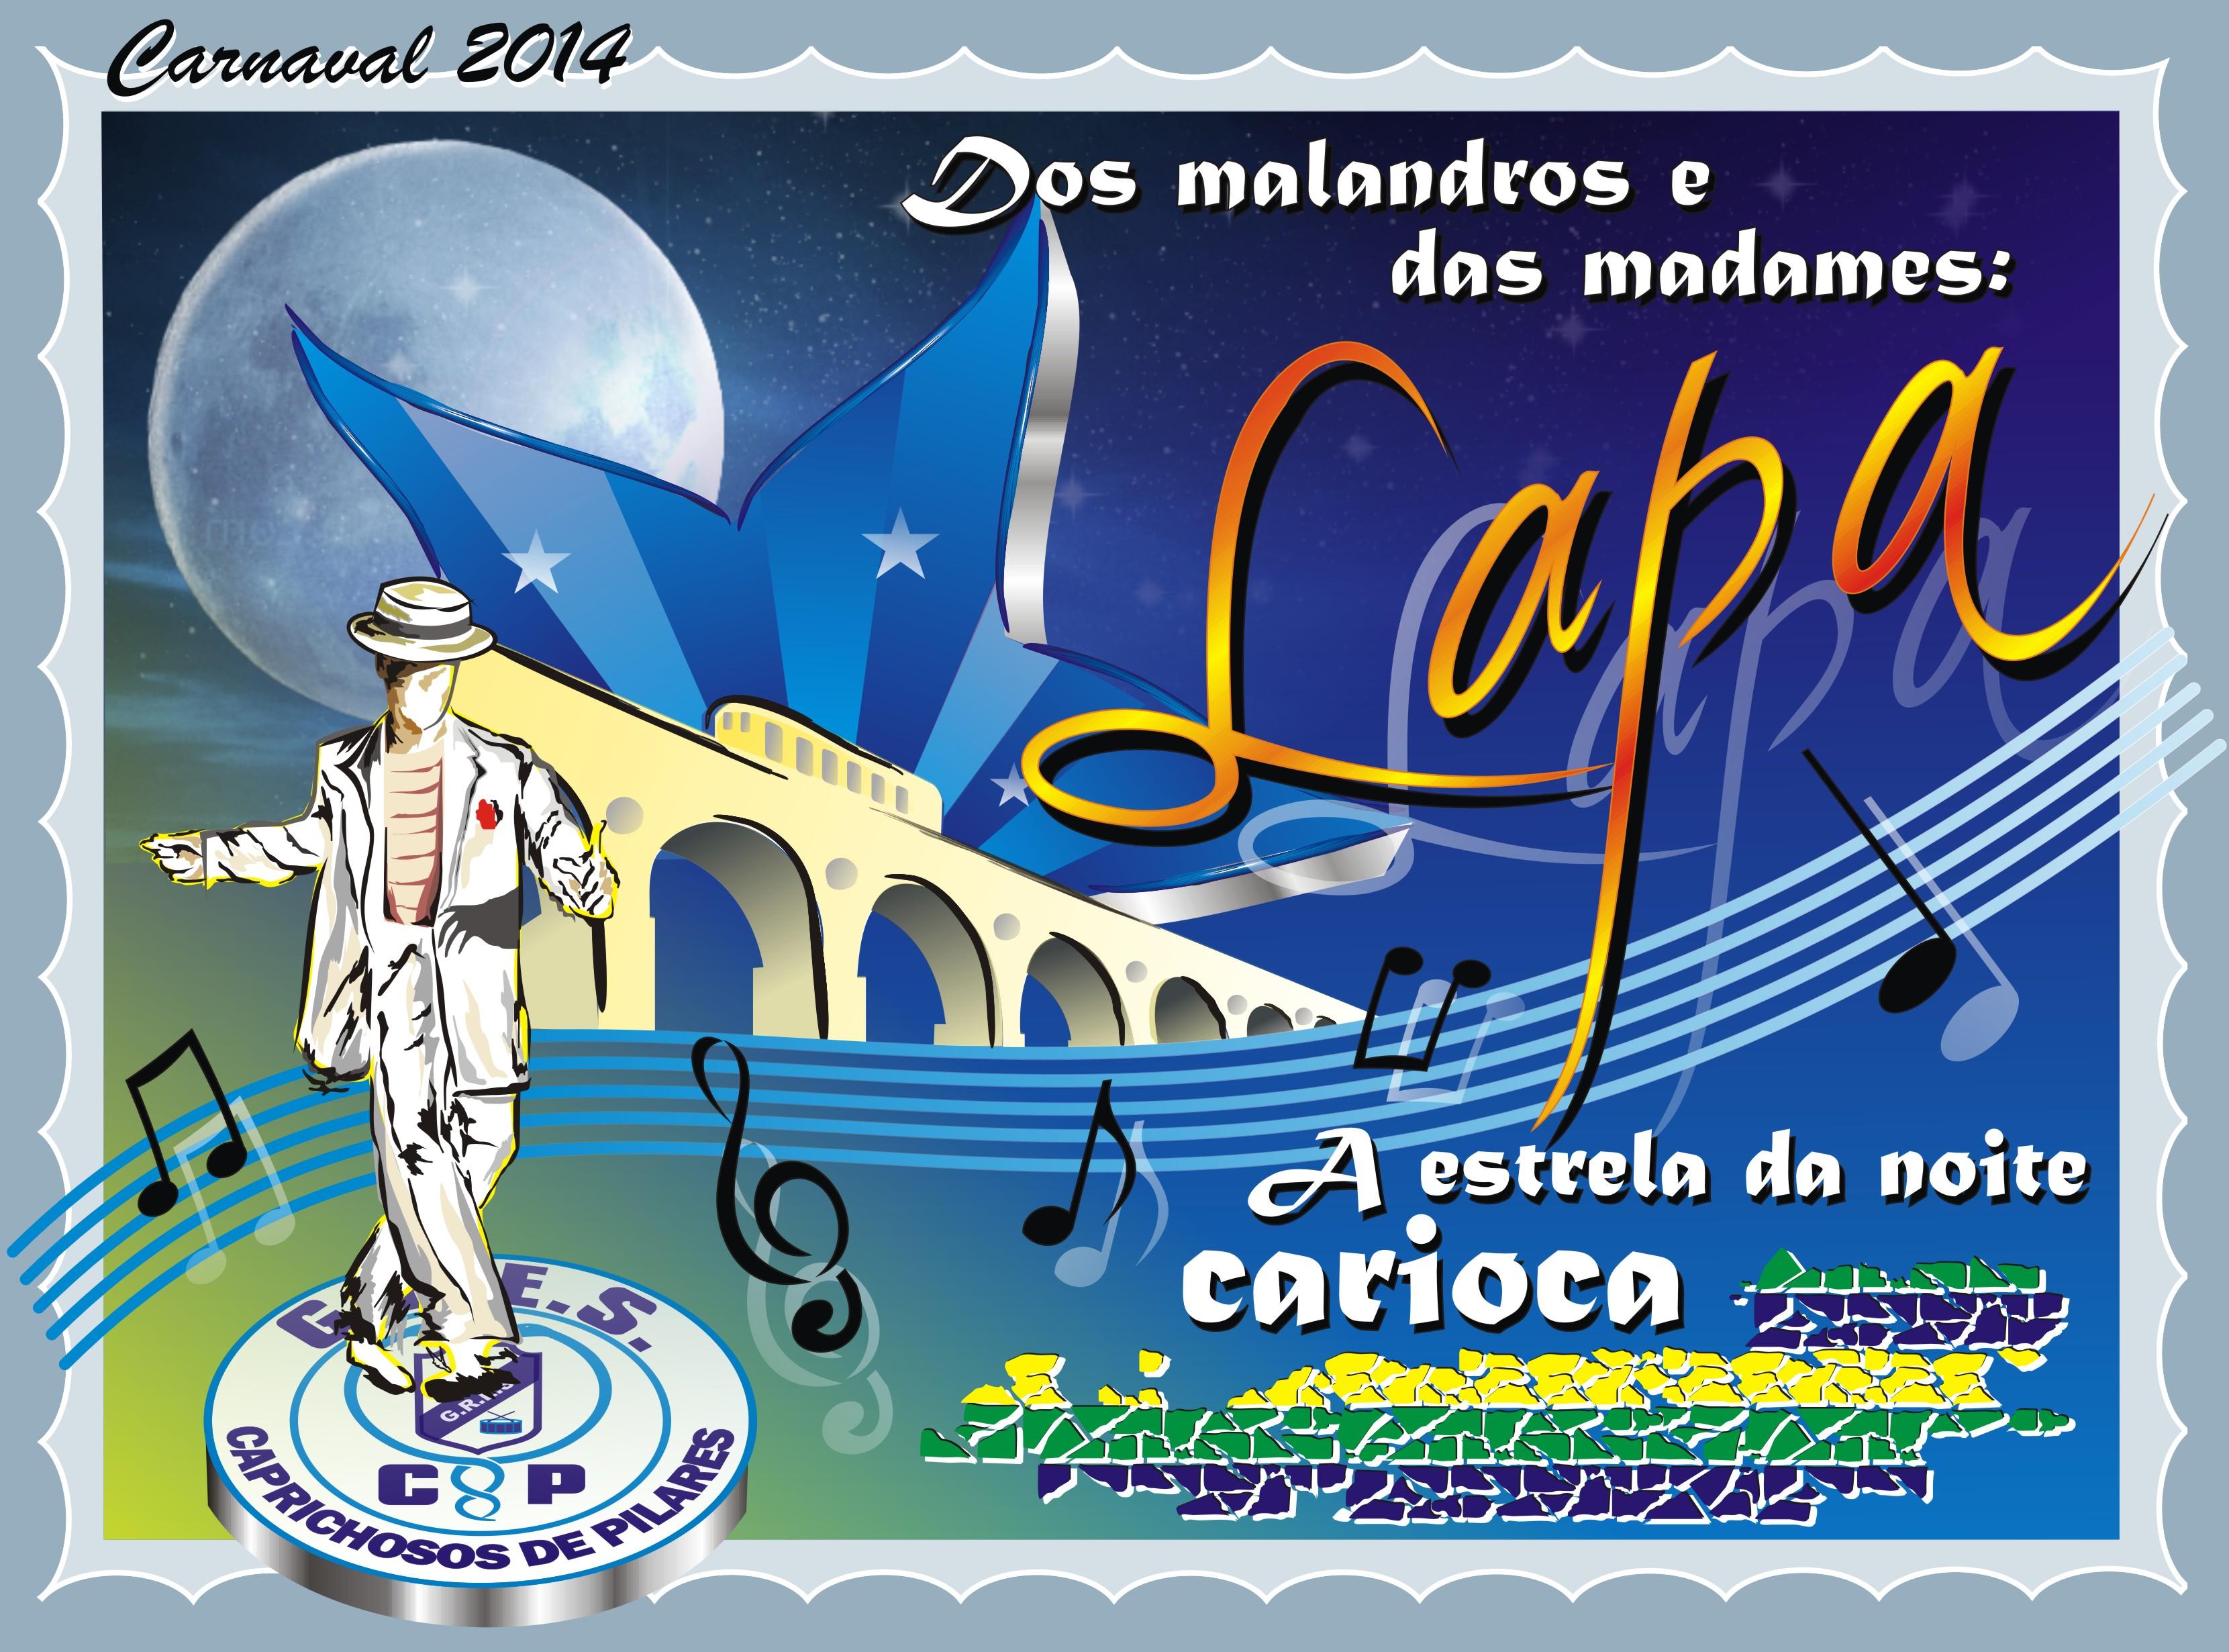 Caprichosos faz final de samba nesta sexta